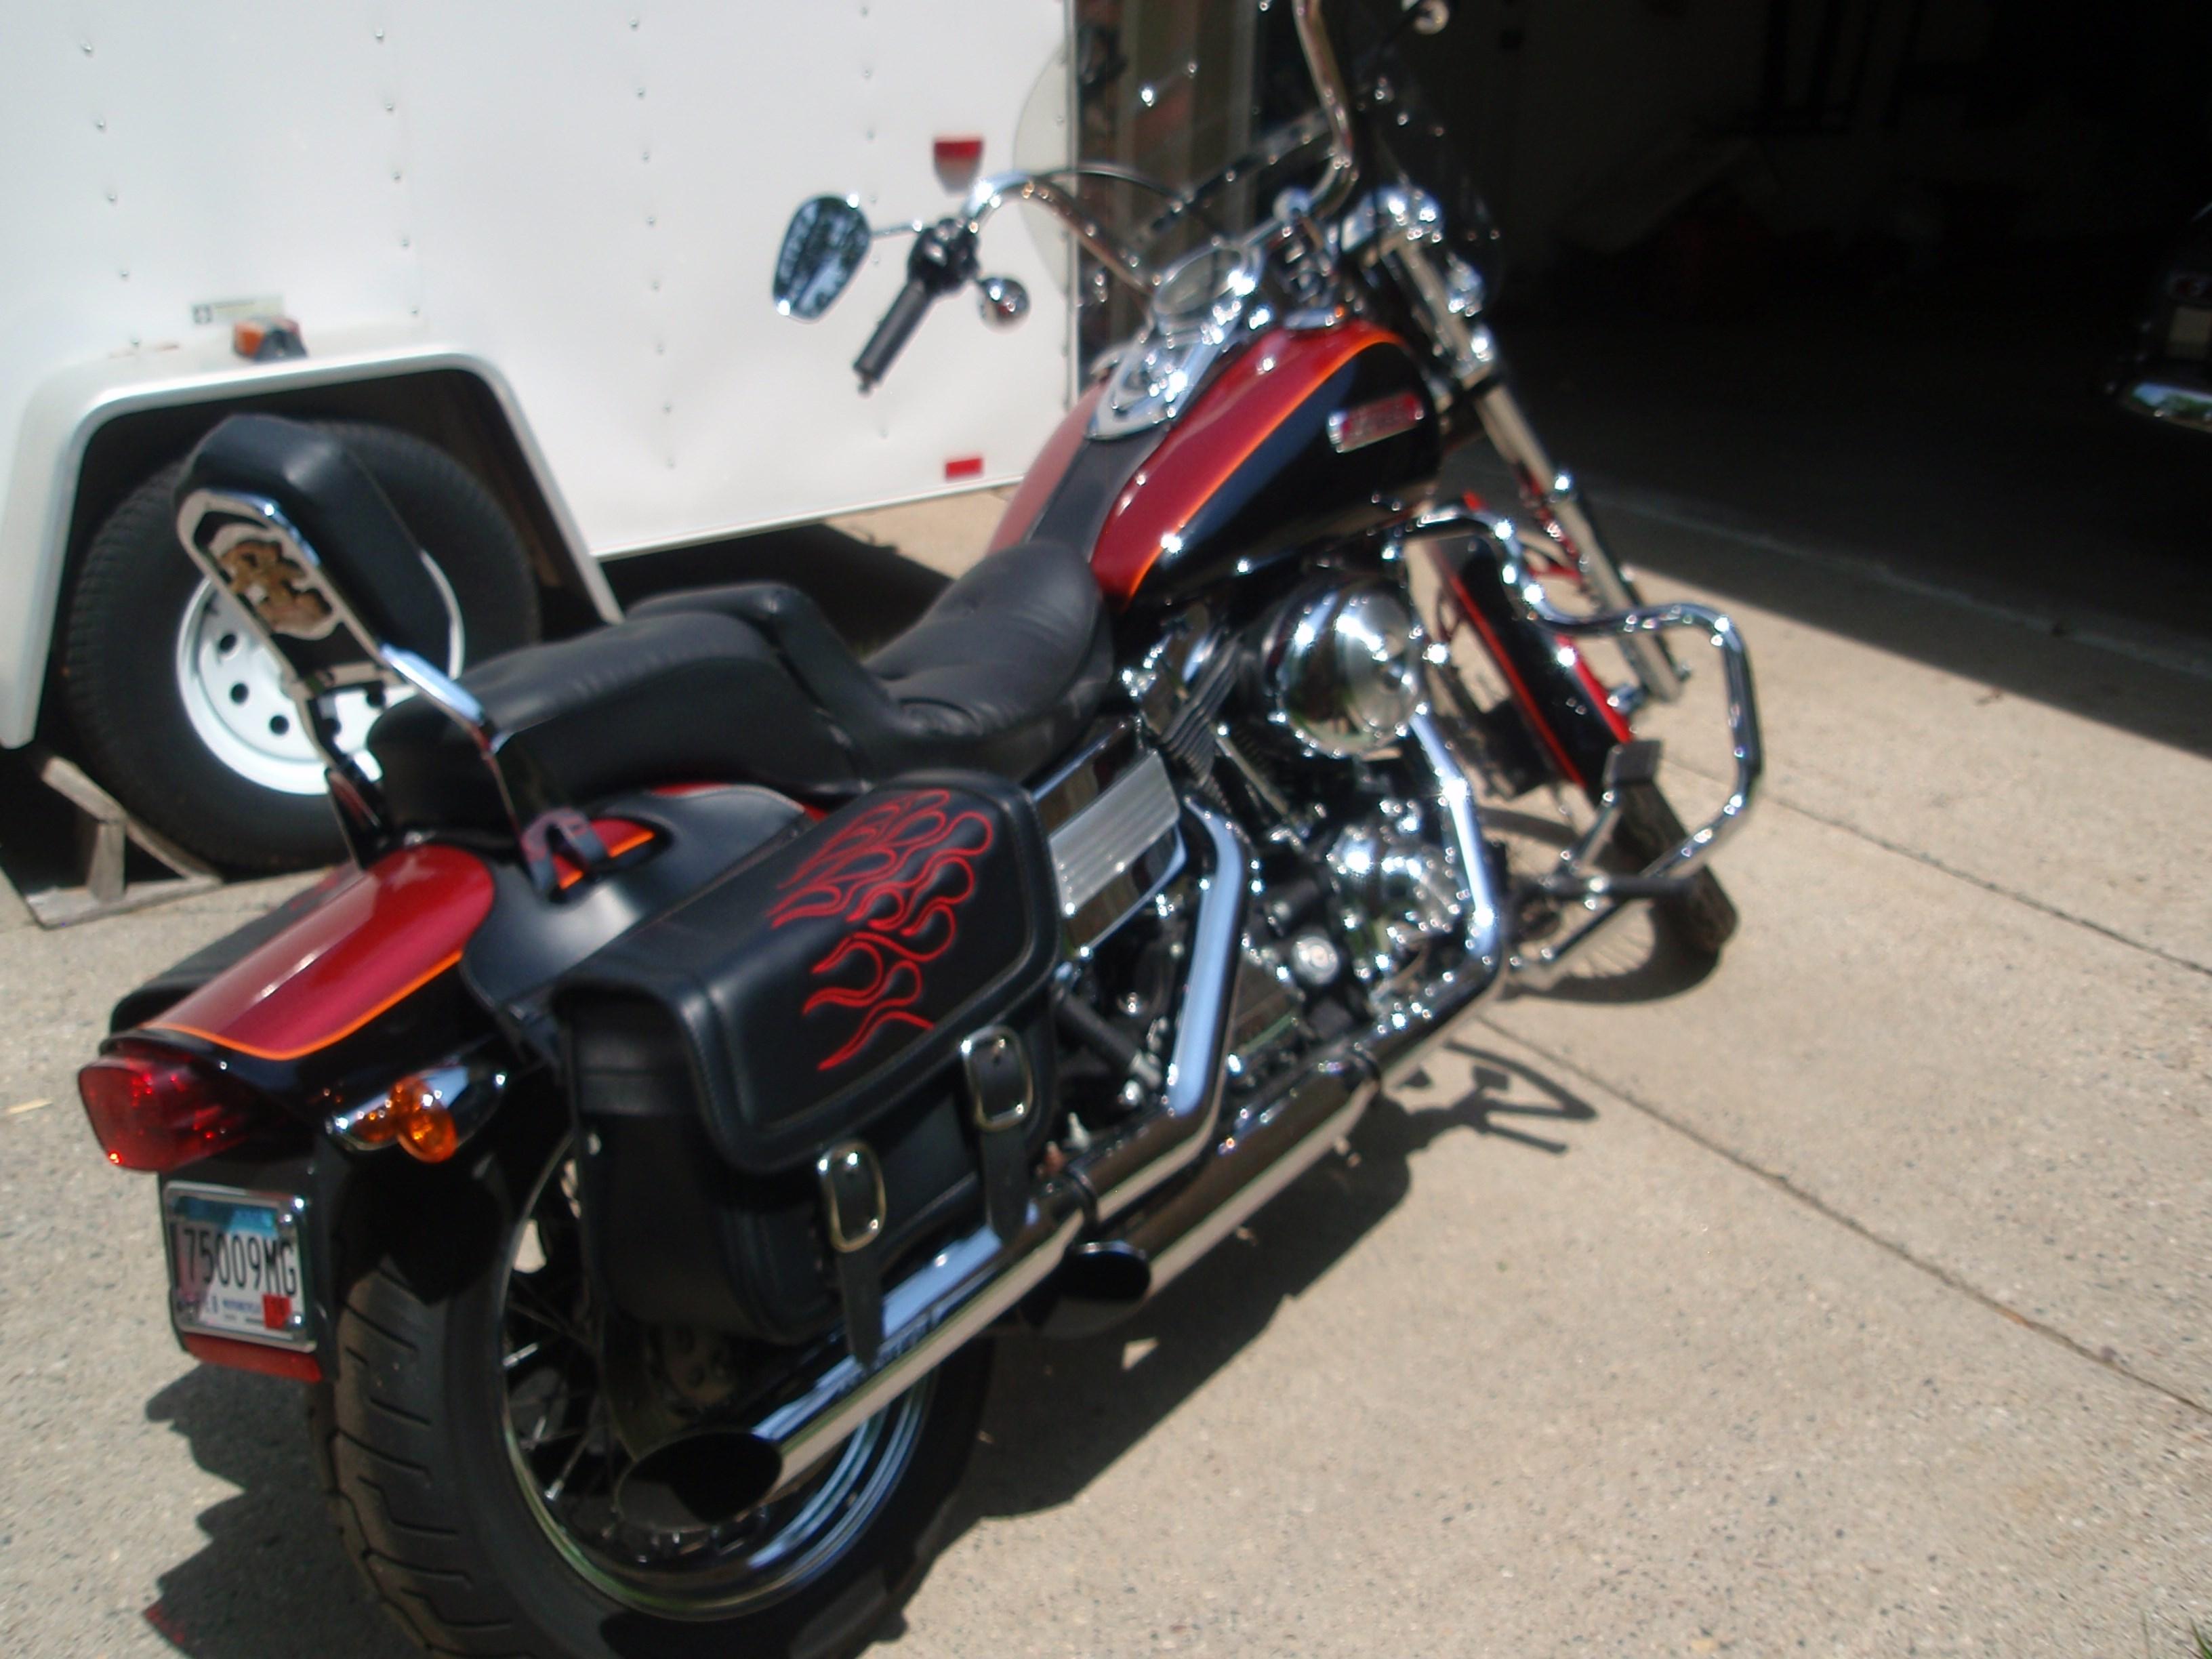 Dyna Motorcycles For Sale Minnesota >> 2006 Harley-Davidson® FXDWG/I Dyna® Wide Glide® (red & balck), apple valley, Minnesota (710643 ...